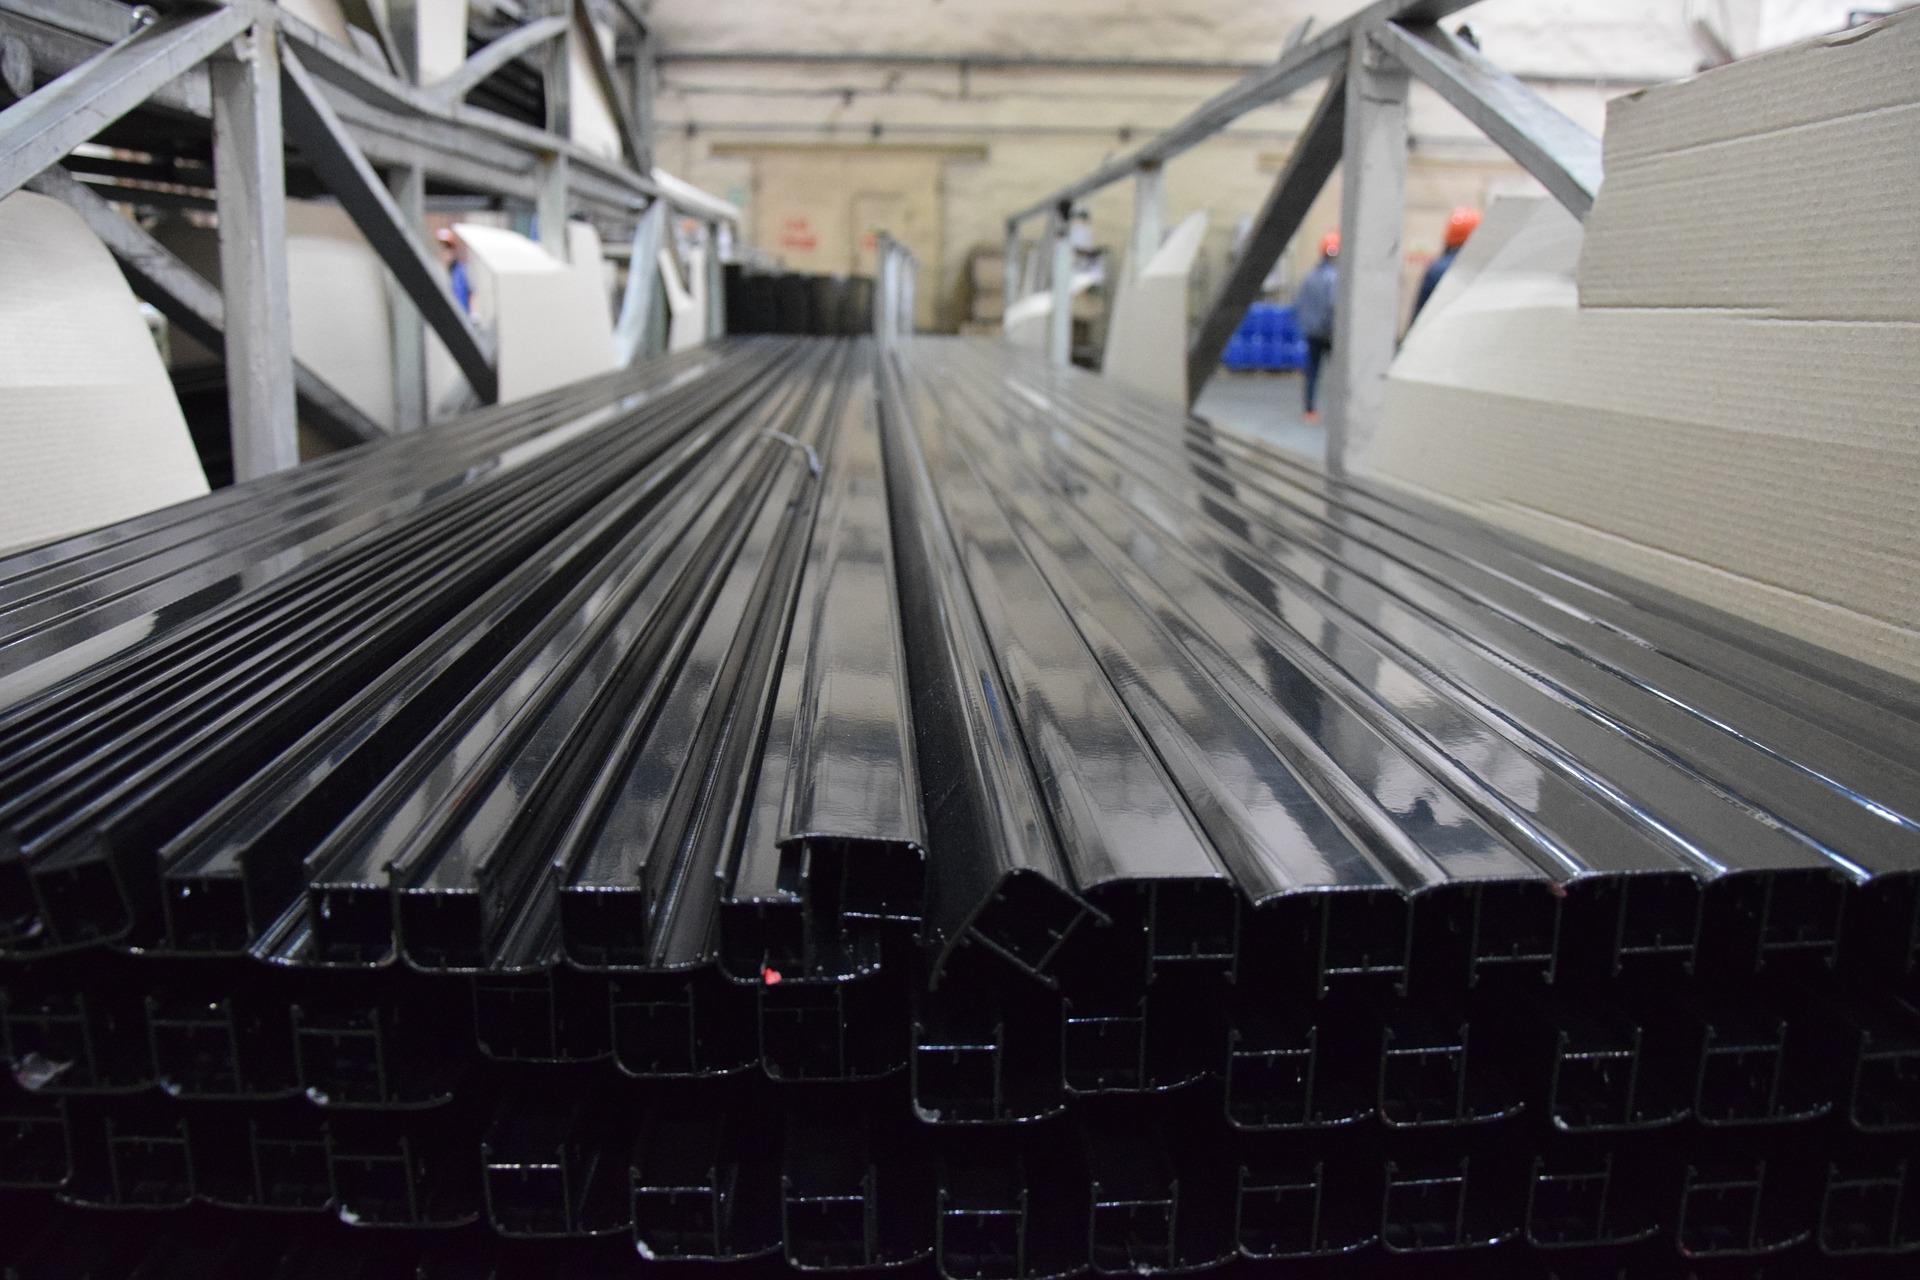 Profile aluminiowe kształtowniki aluminiowe